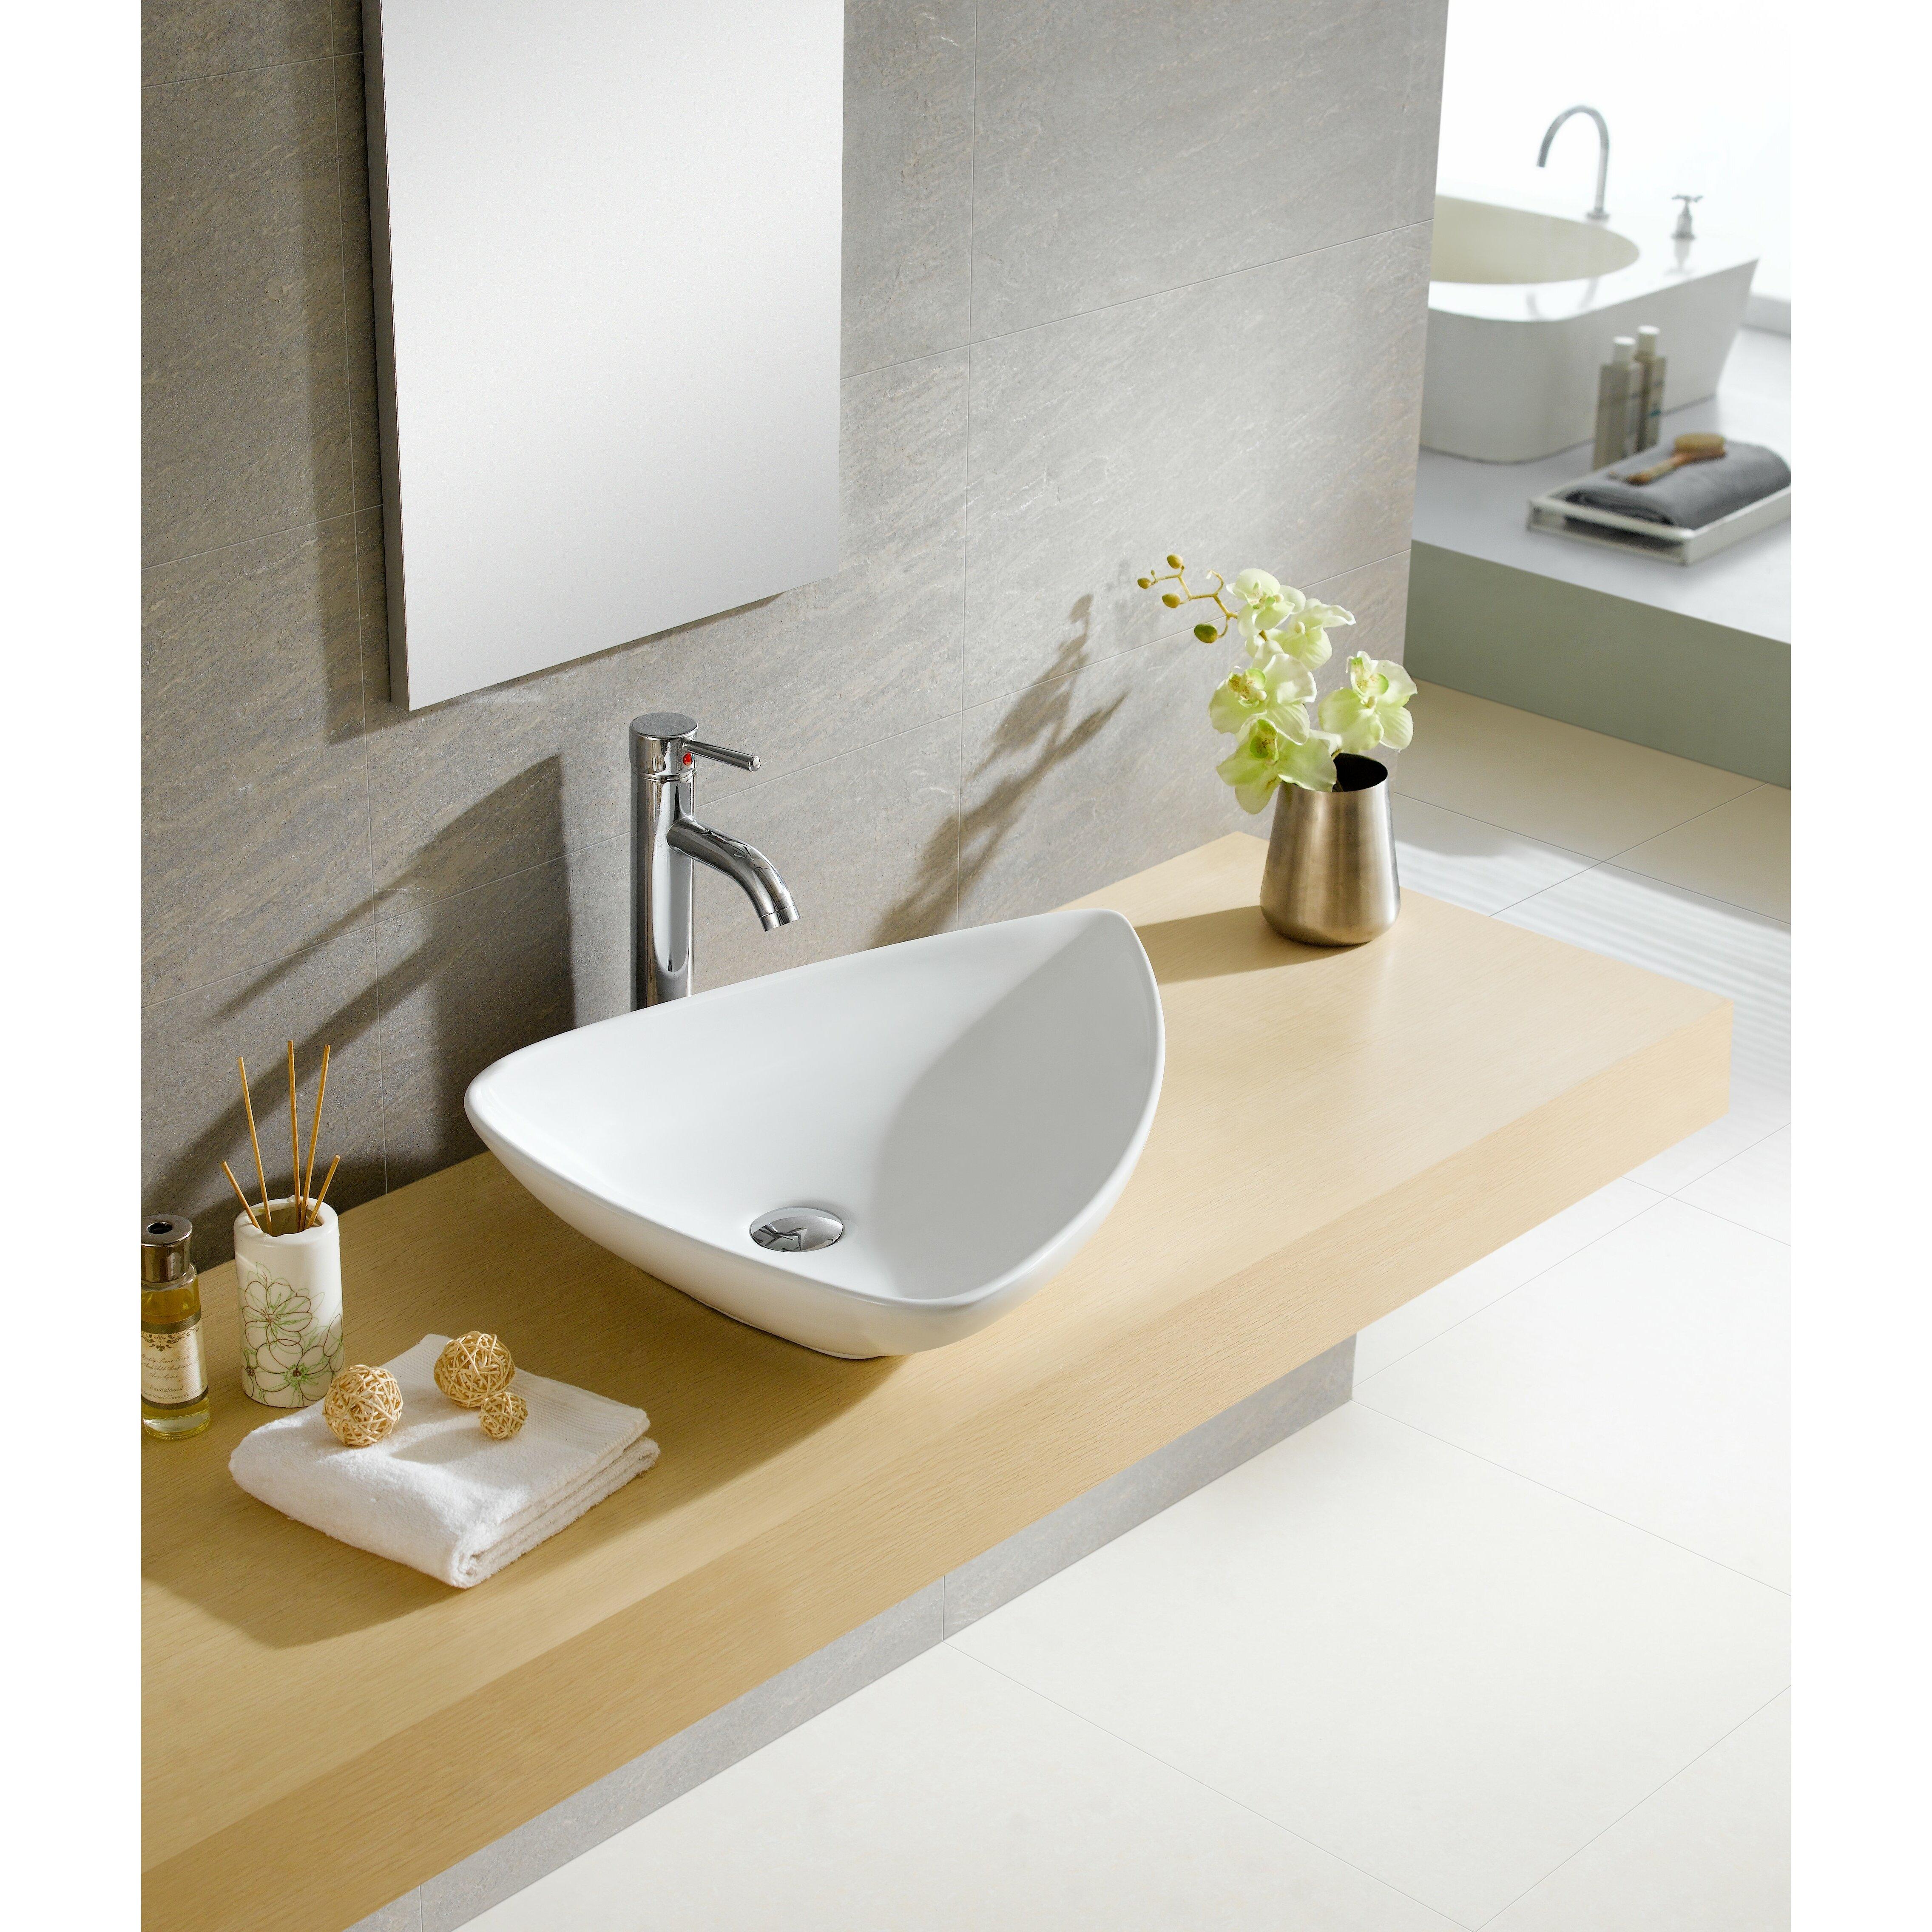 Fine Fixtures Modern Vitreous Triangular Vessel Sink Vessel Bathroom Sink Reviews Wayfair